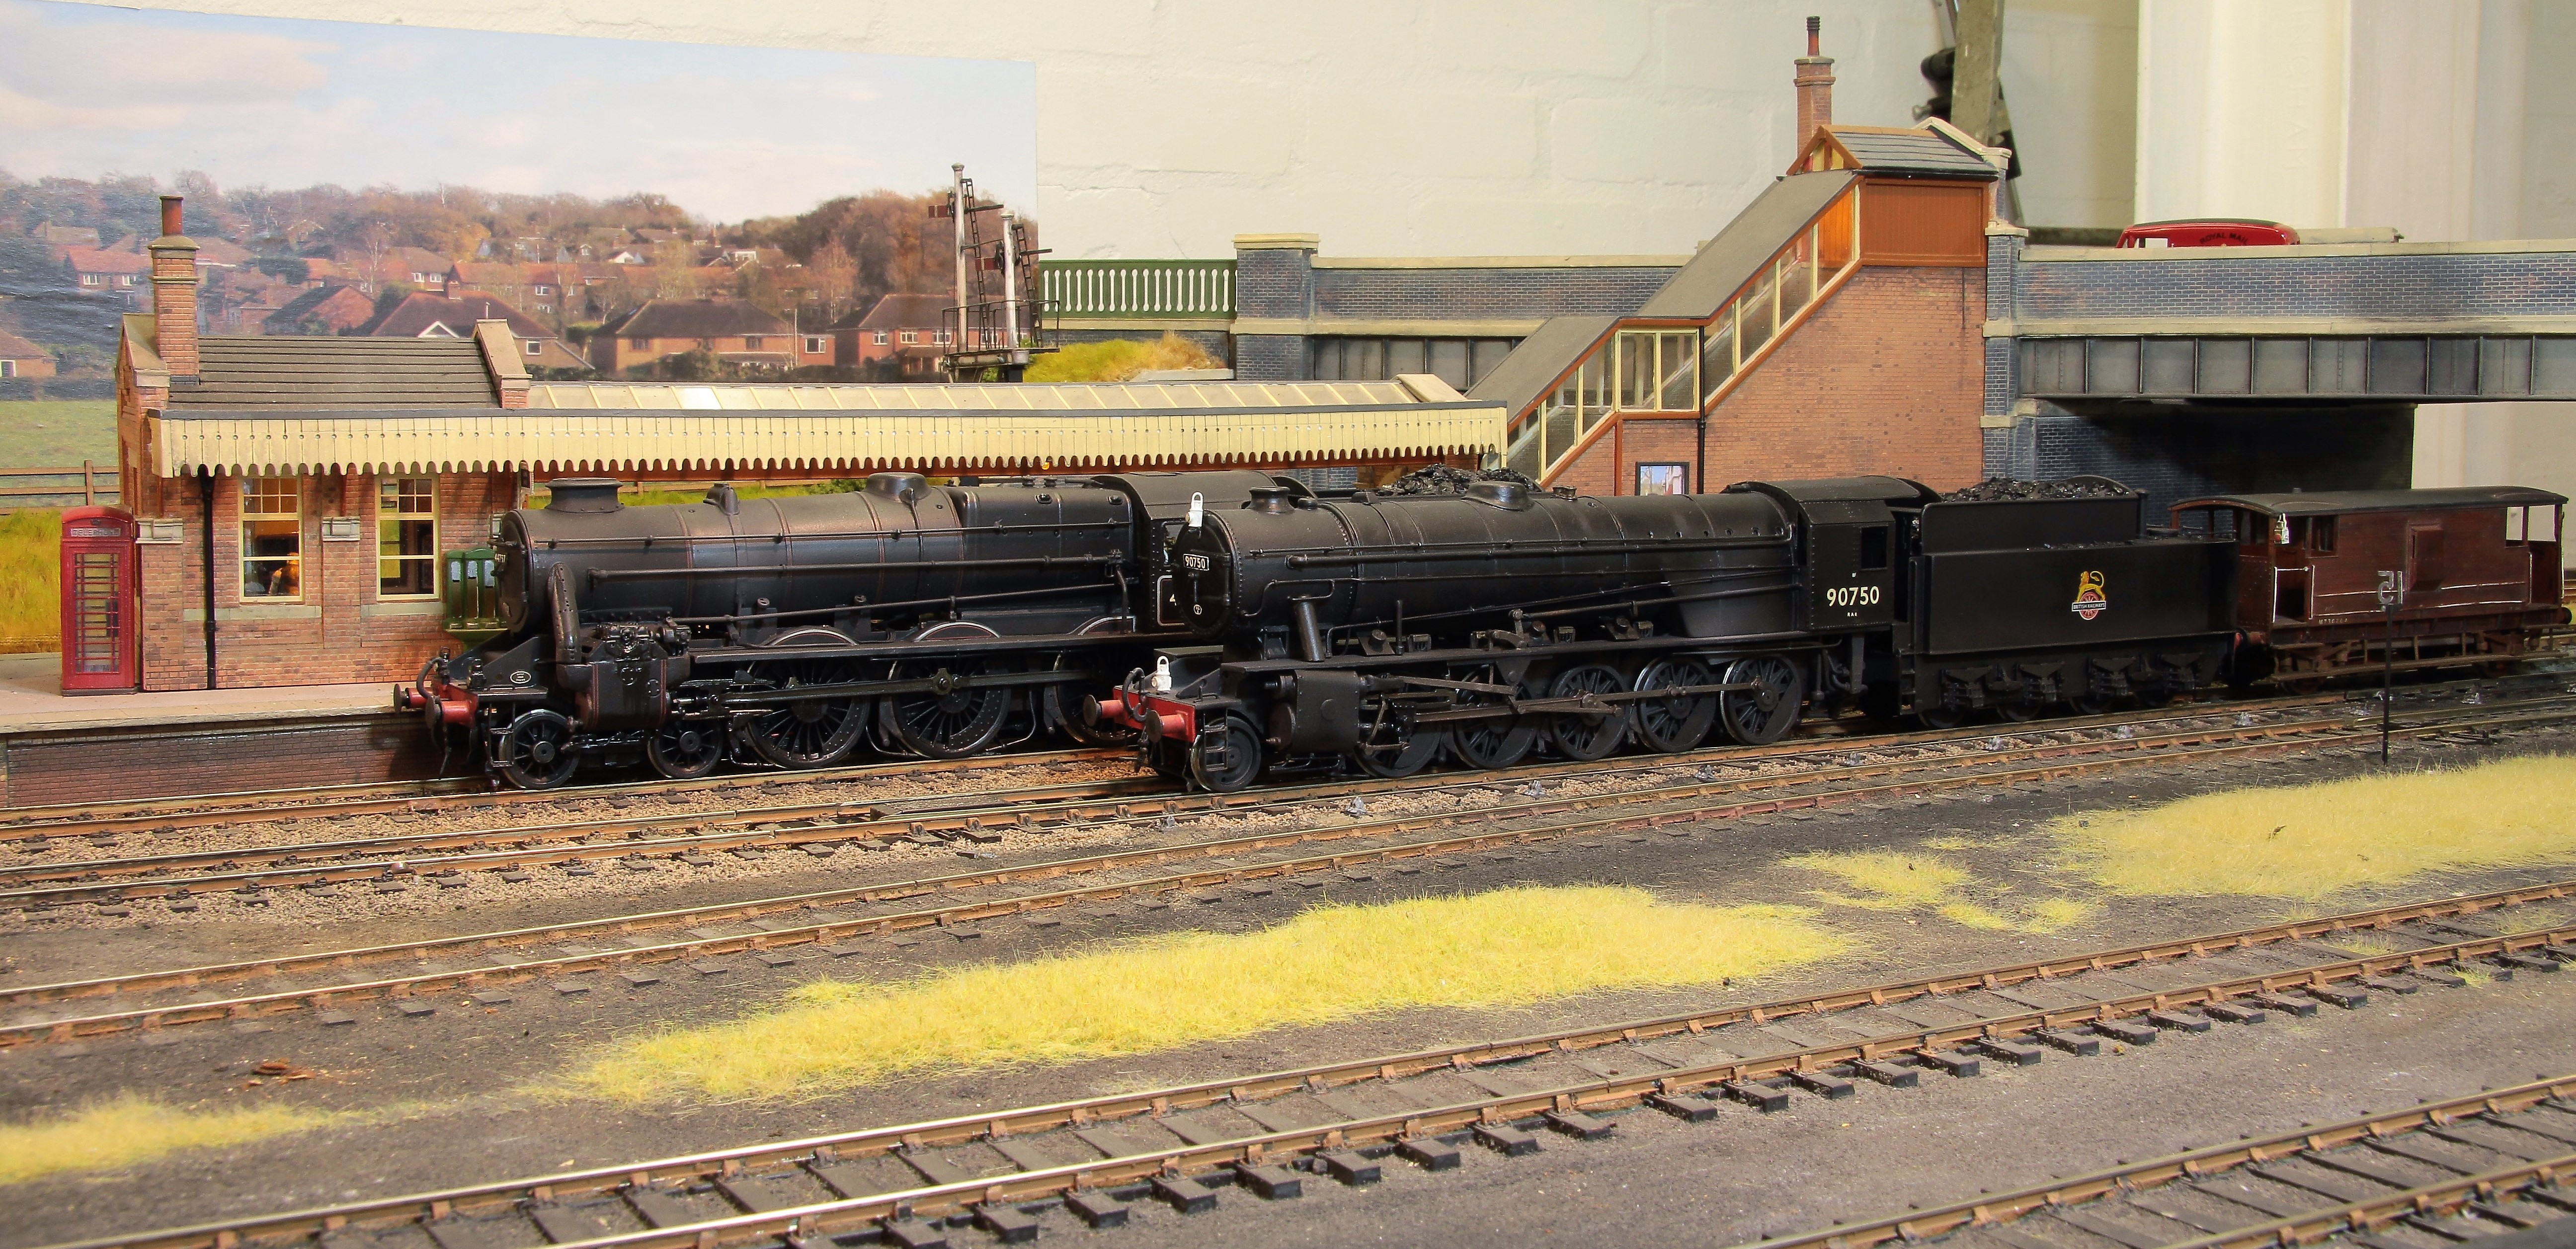 8696 LMS Stanier 'Caprotti' black five 4